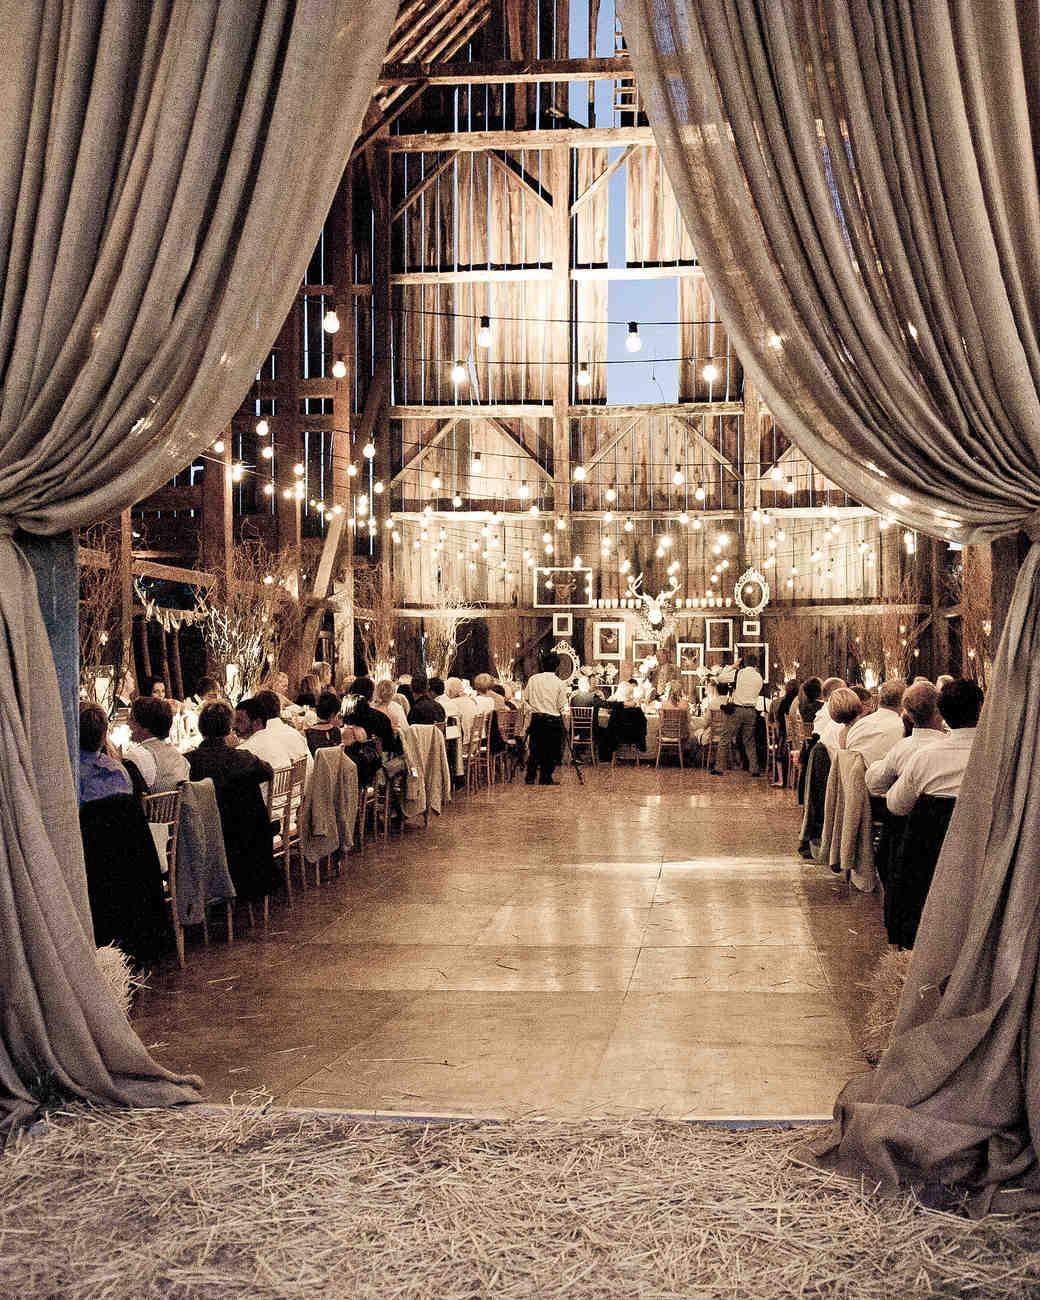 The Venue: Vintage Barn Wedding Venue At Websimilar.org